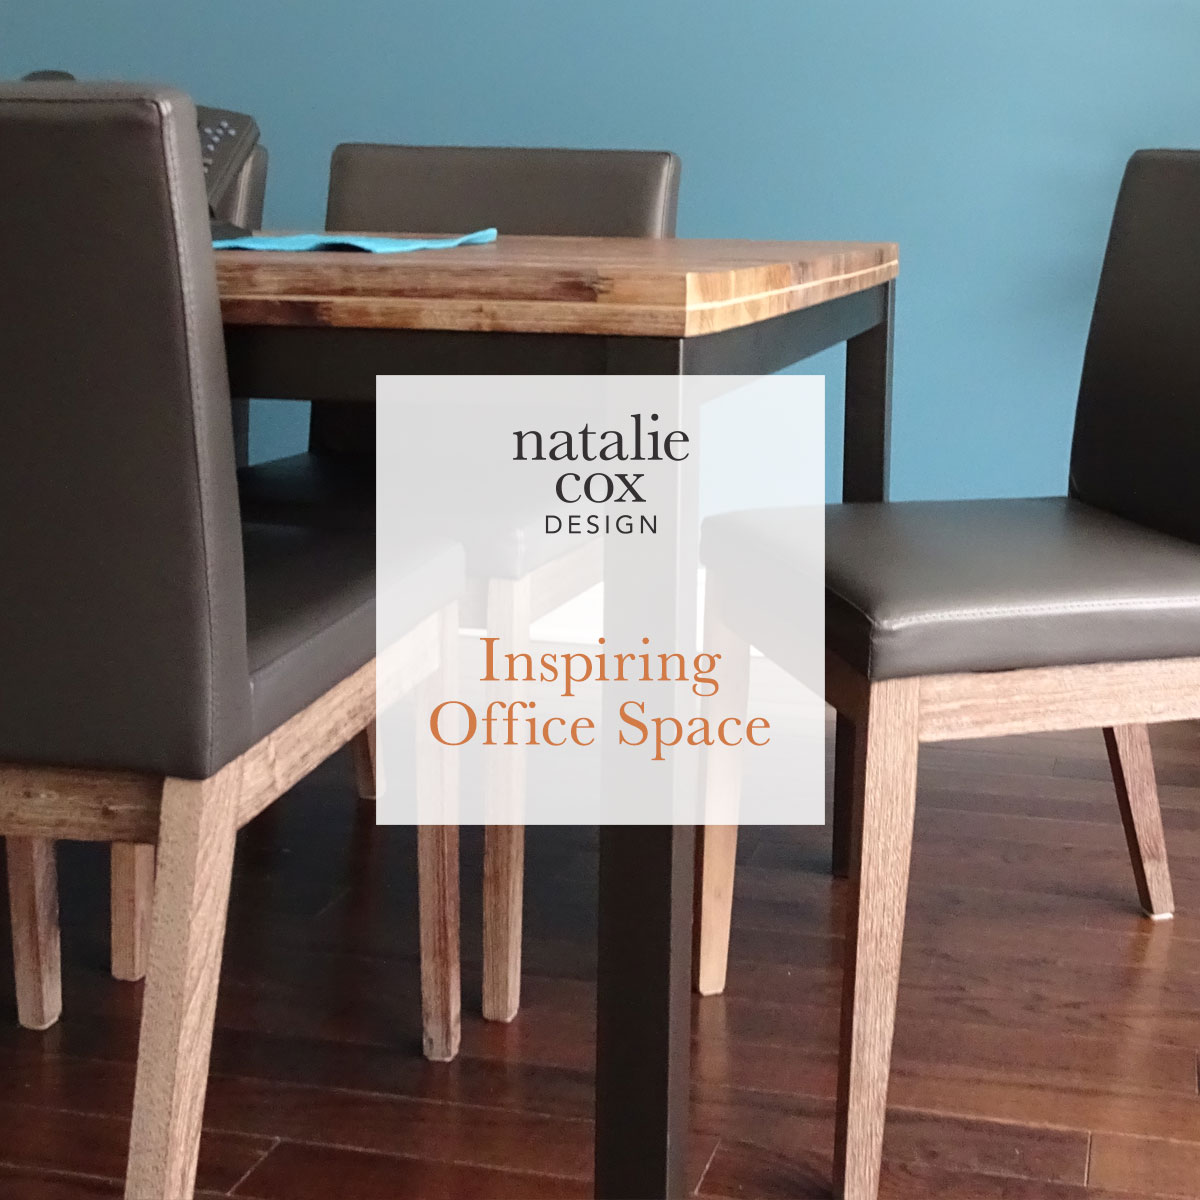 Inspiring Office Space - Natalie Cox Design - Interior Decorator - Ottawa, ON